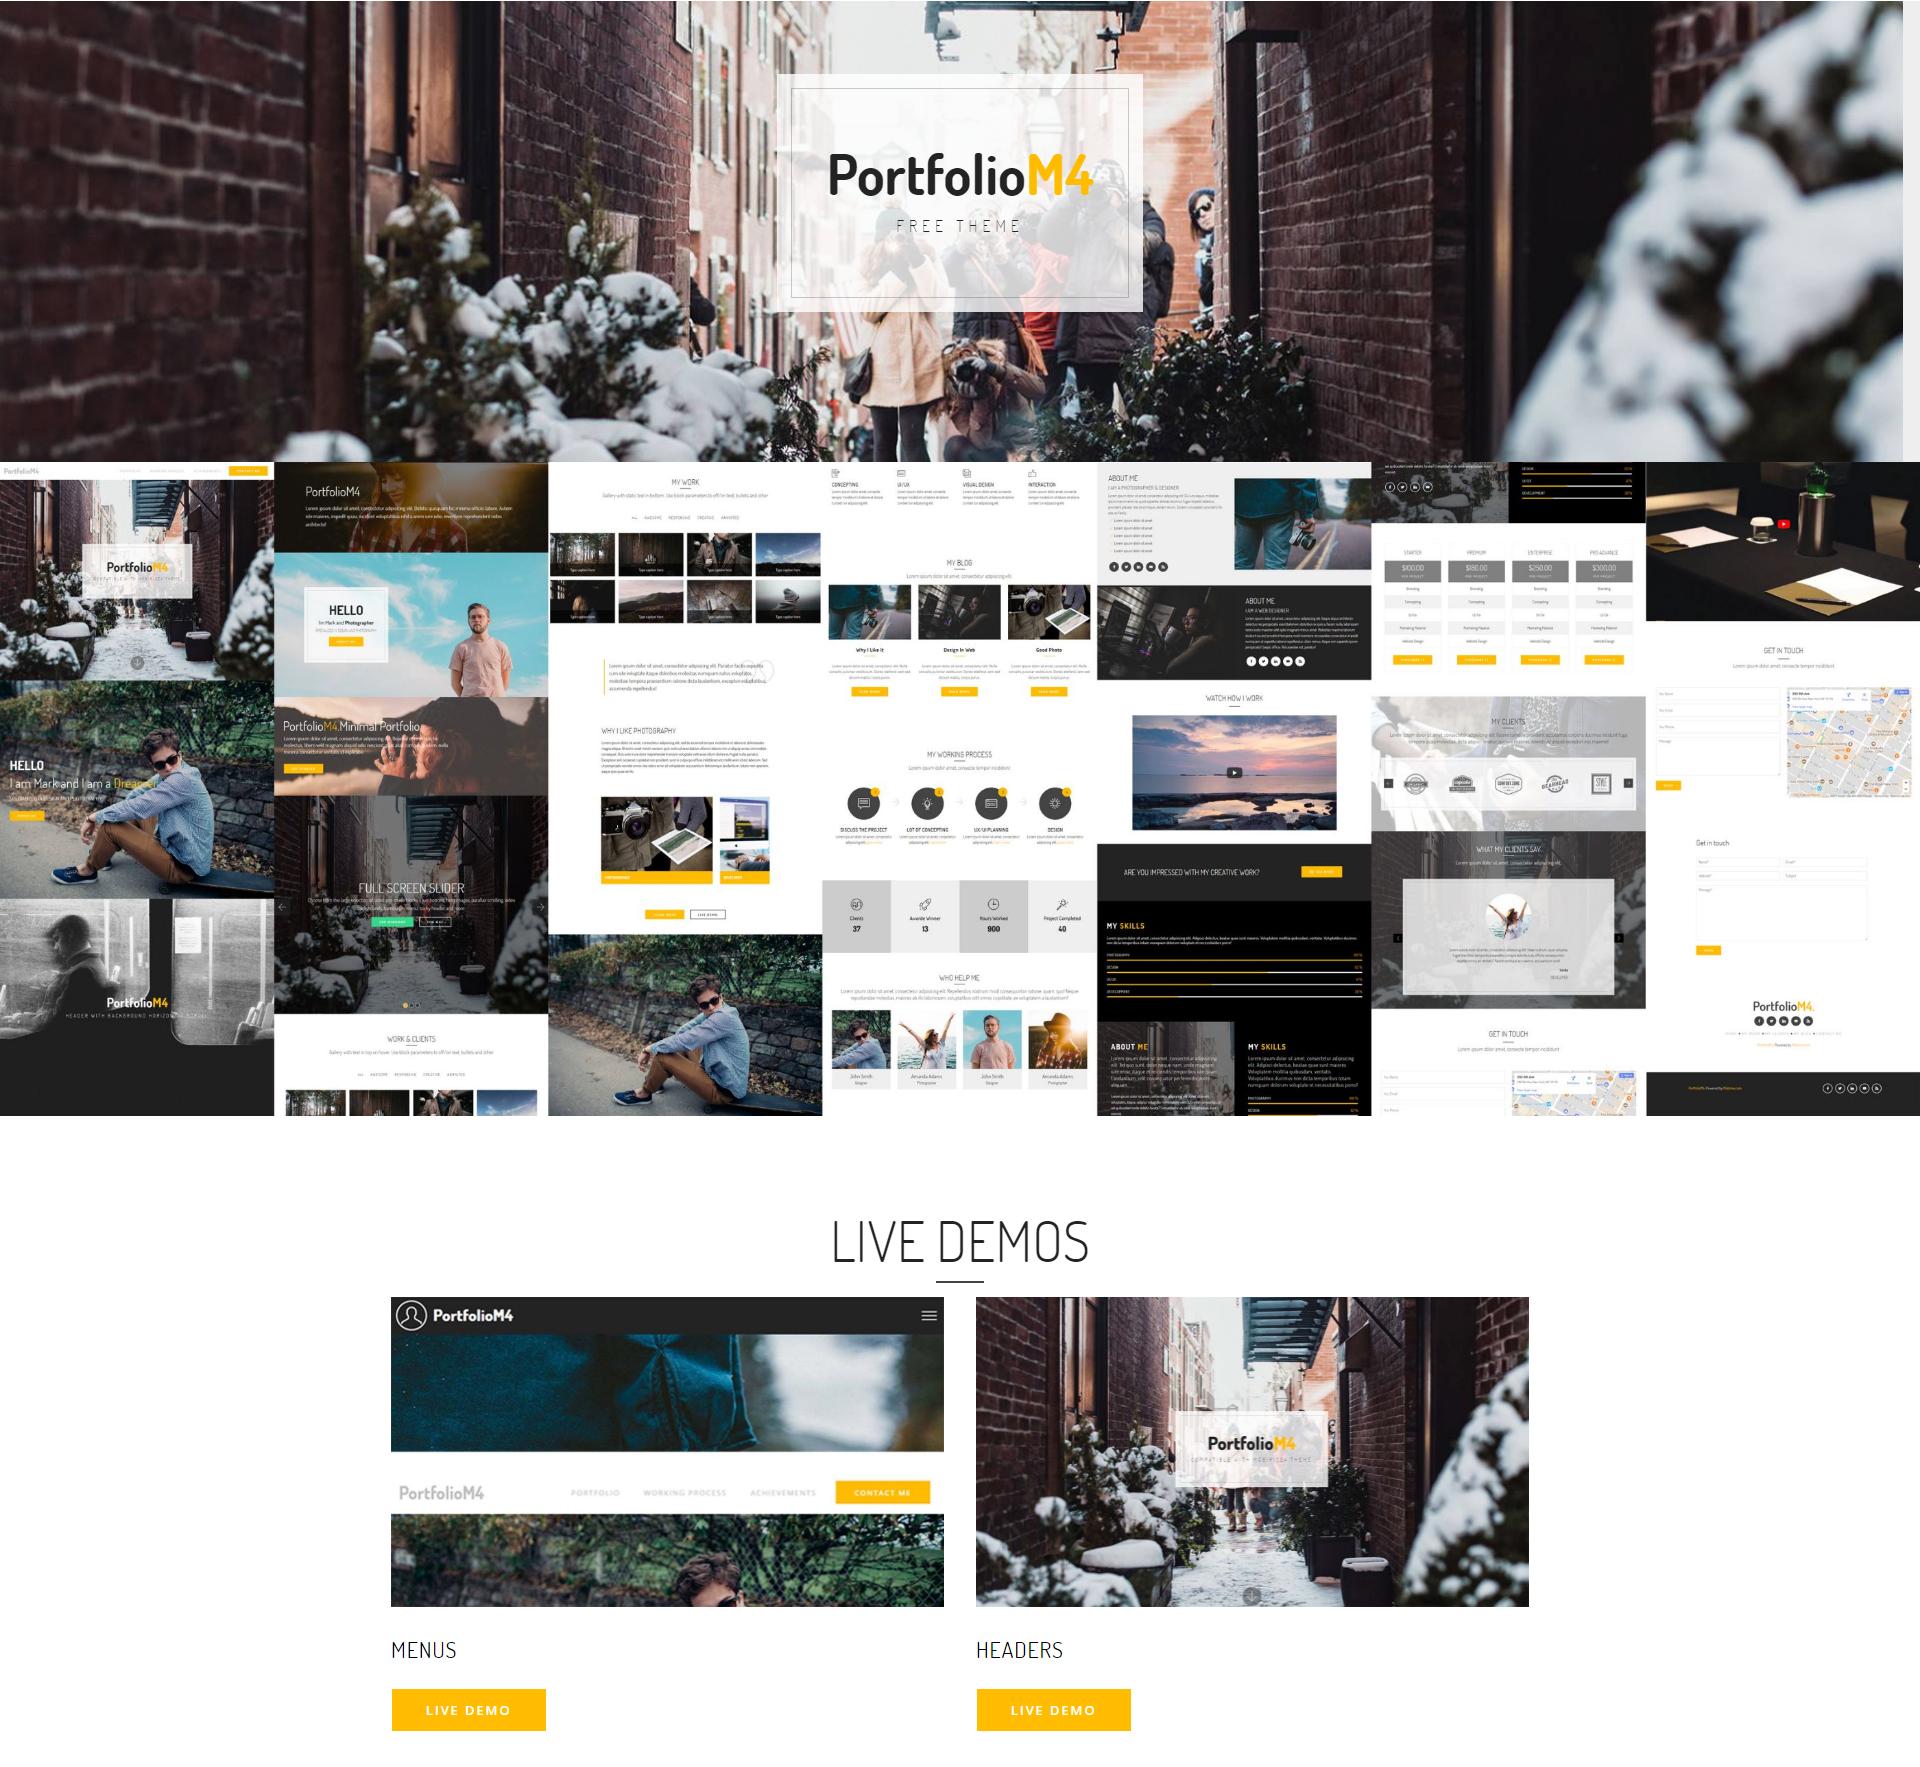 HTML Bootstrap PortfolioM4 Templates